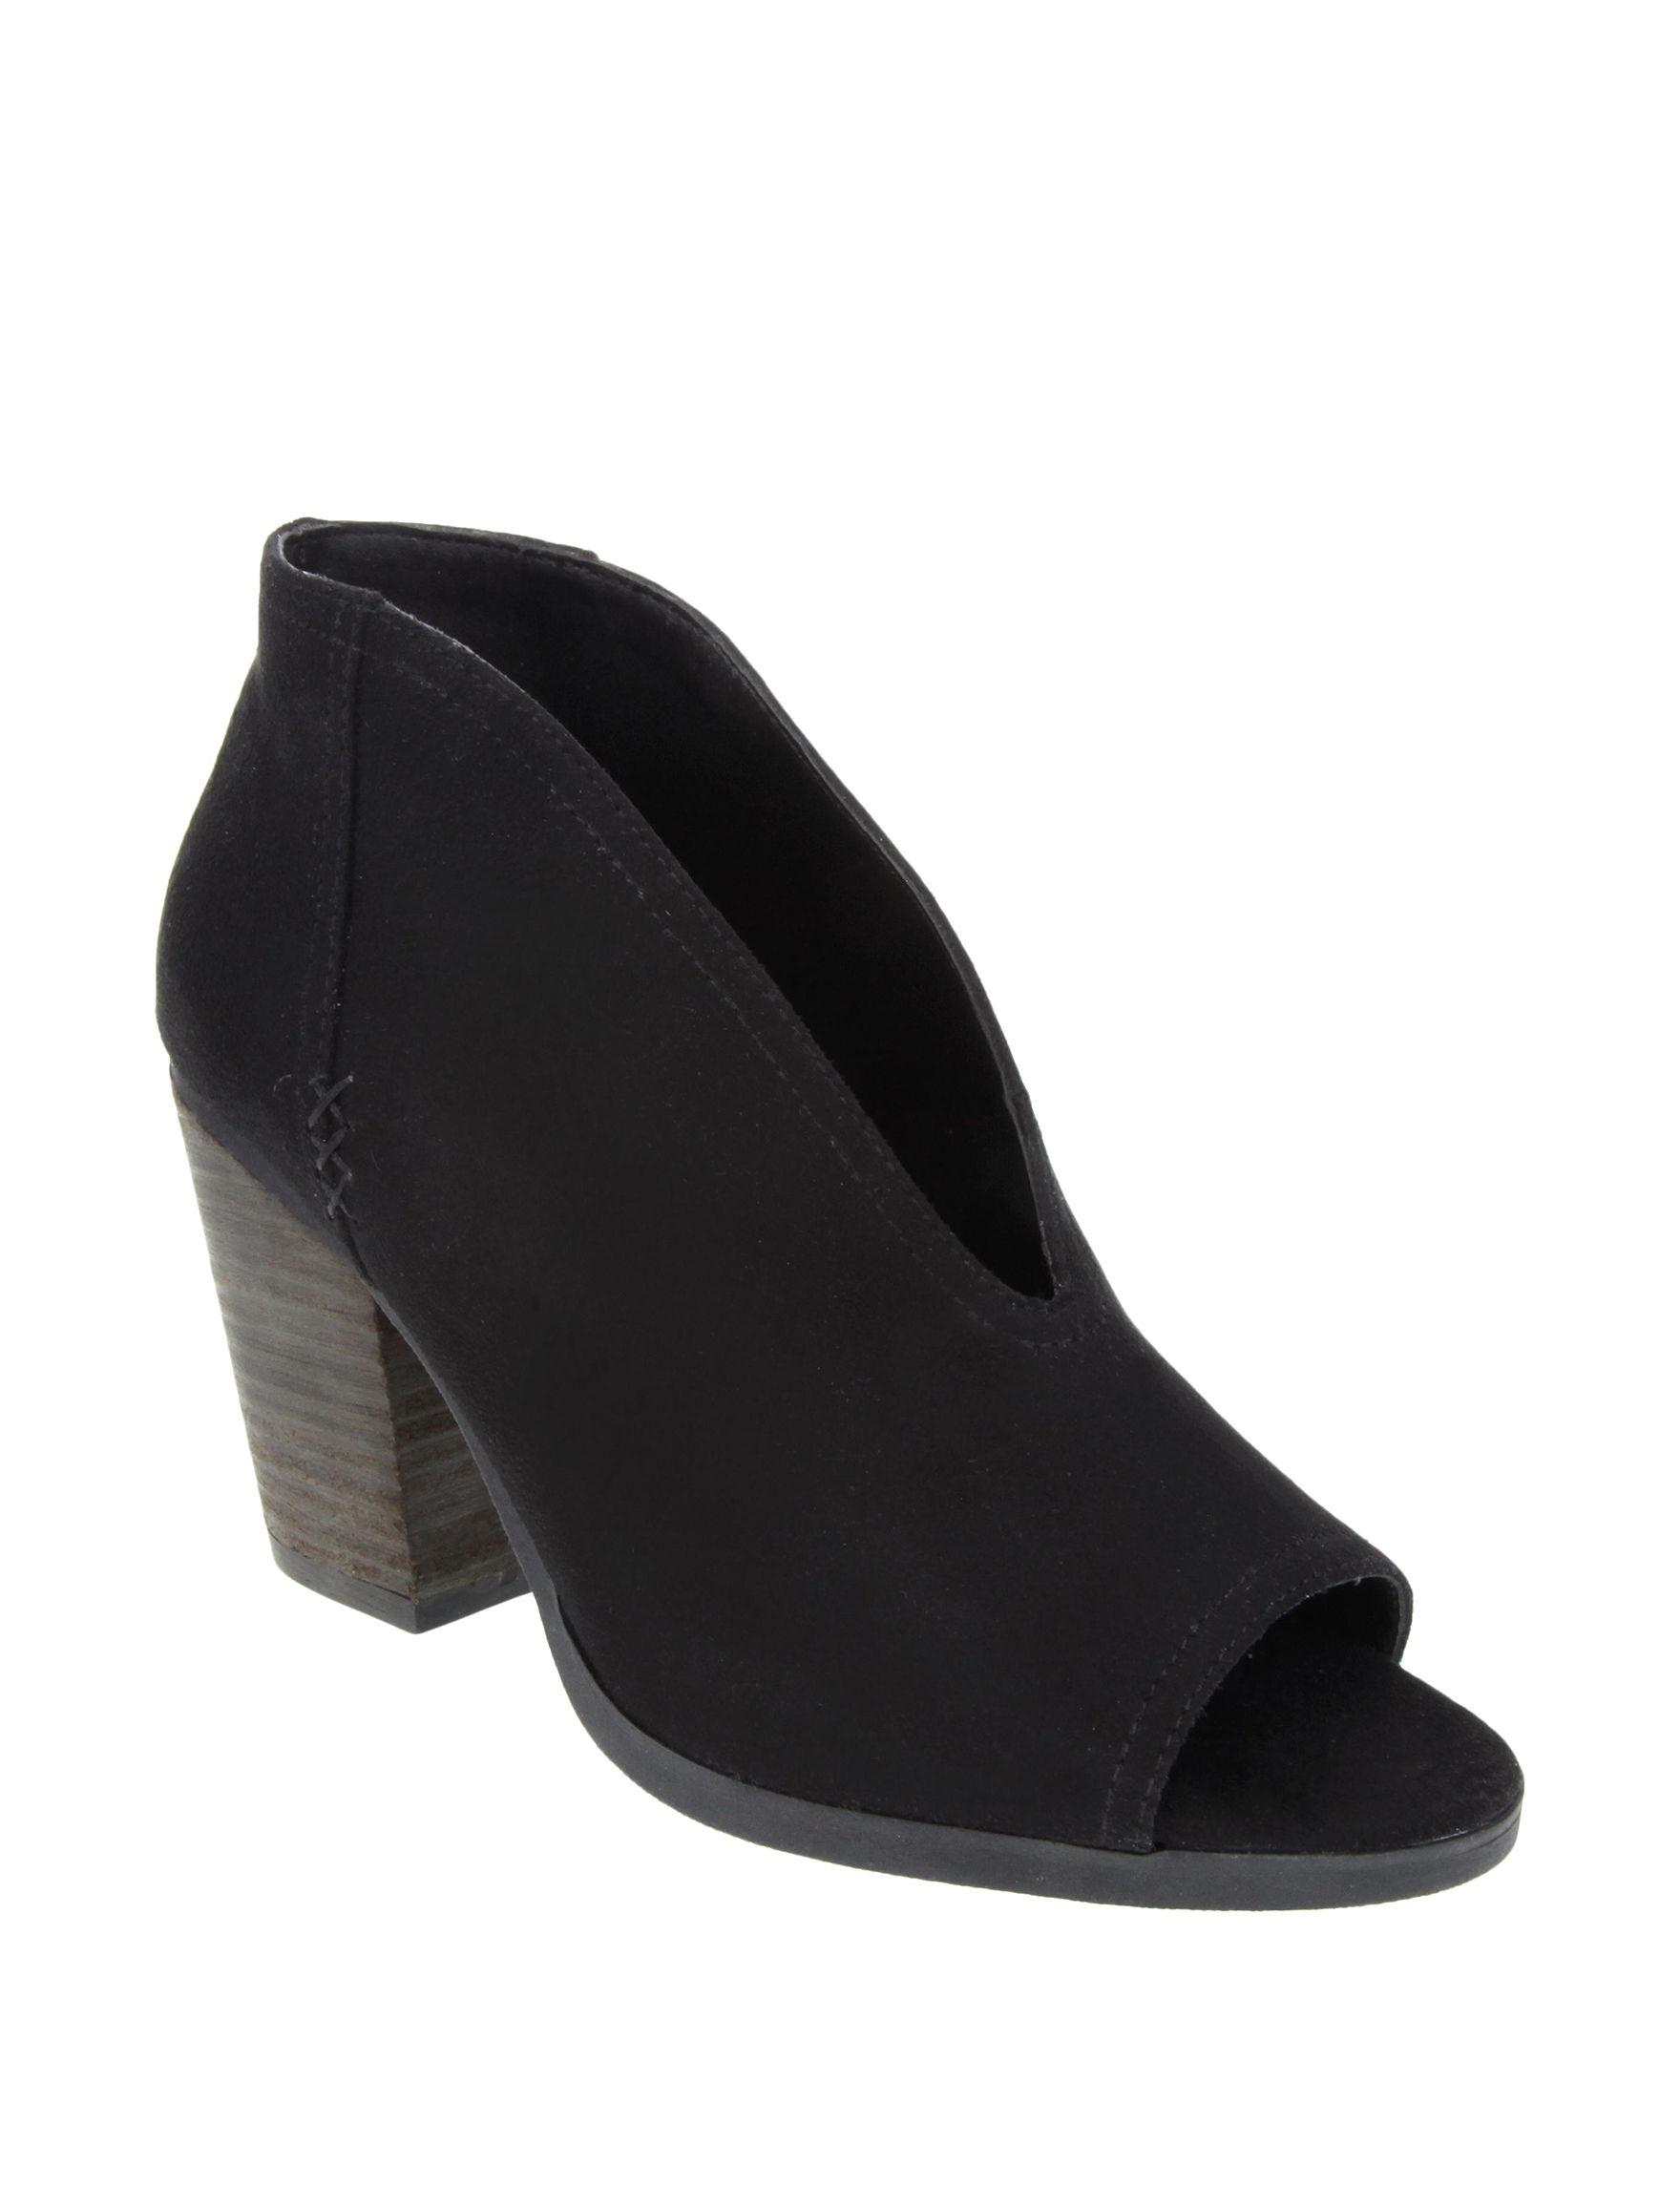 Sugar Black Ankle Boots & Booties Peep Toe